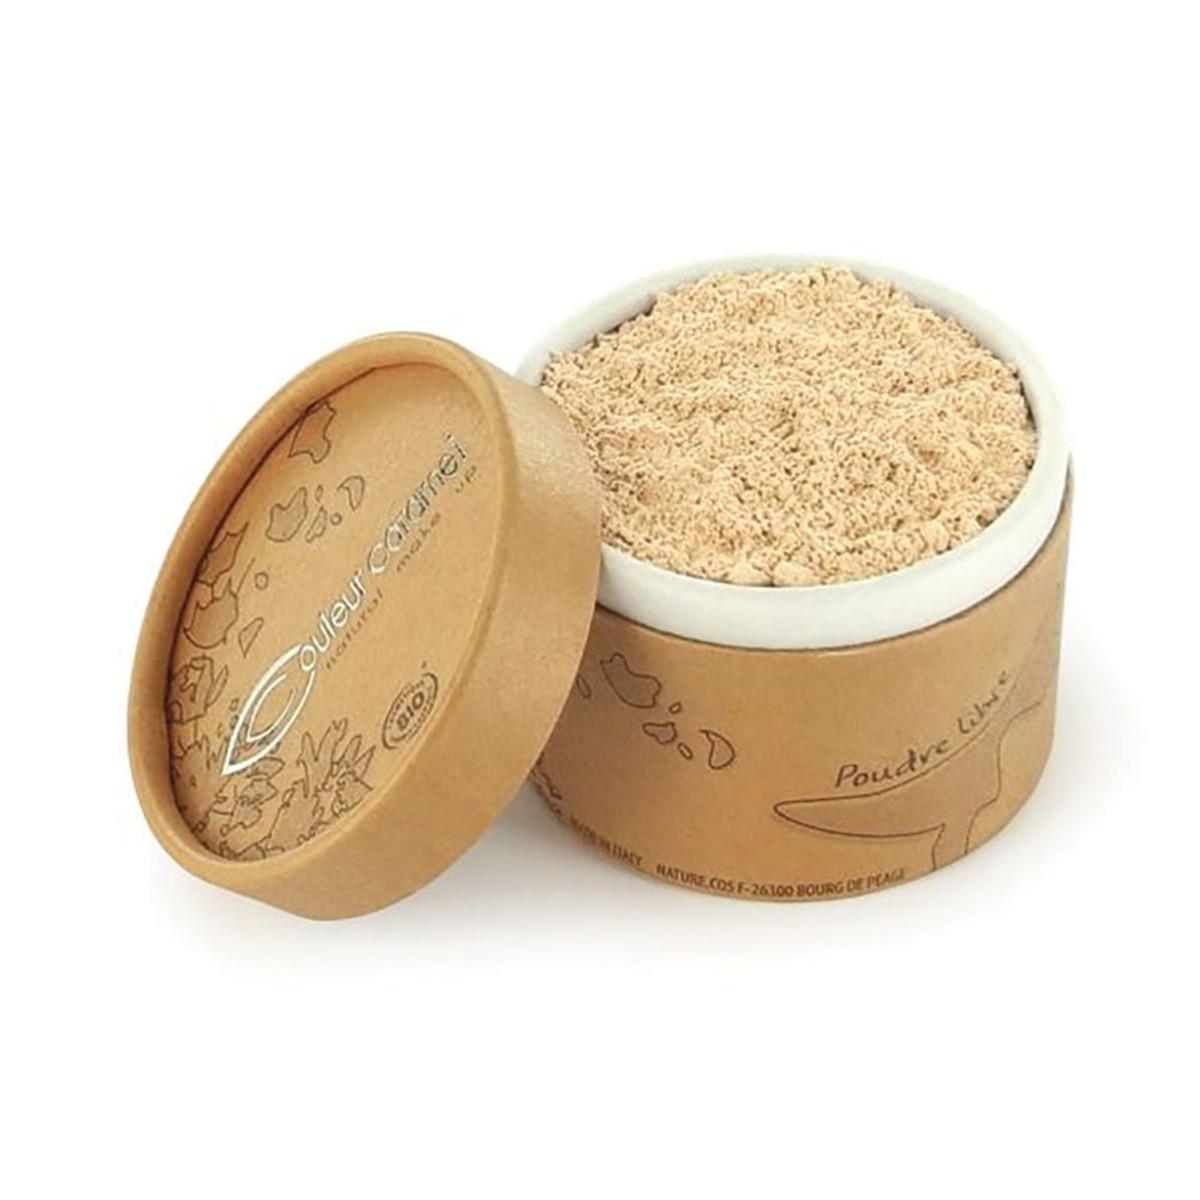 Couleur Caramel Free Powder Light Sandy Beige (01)_media-01